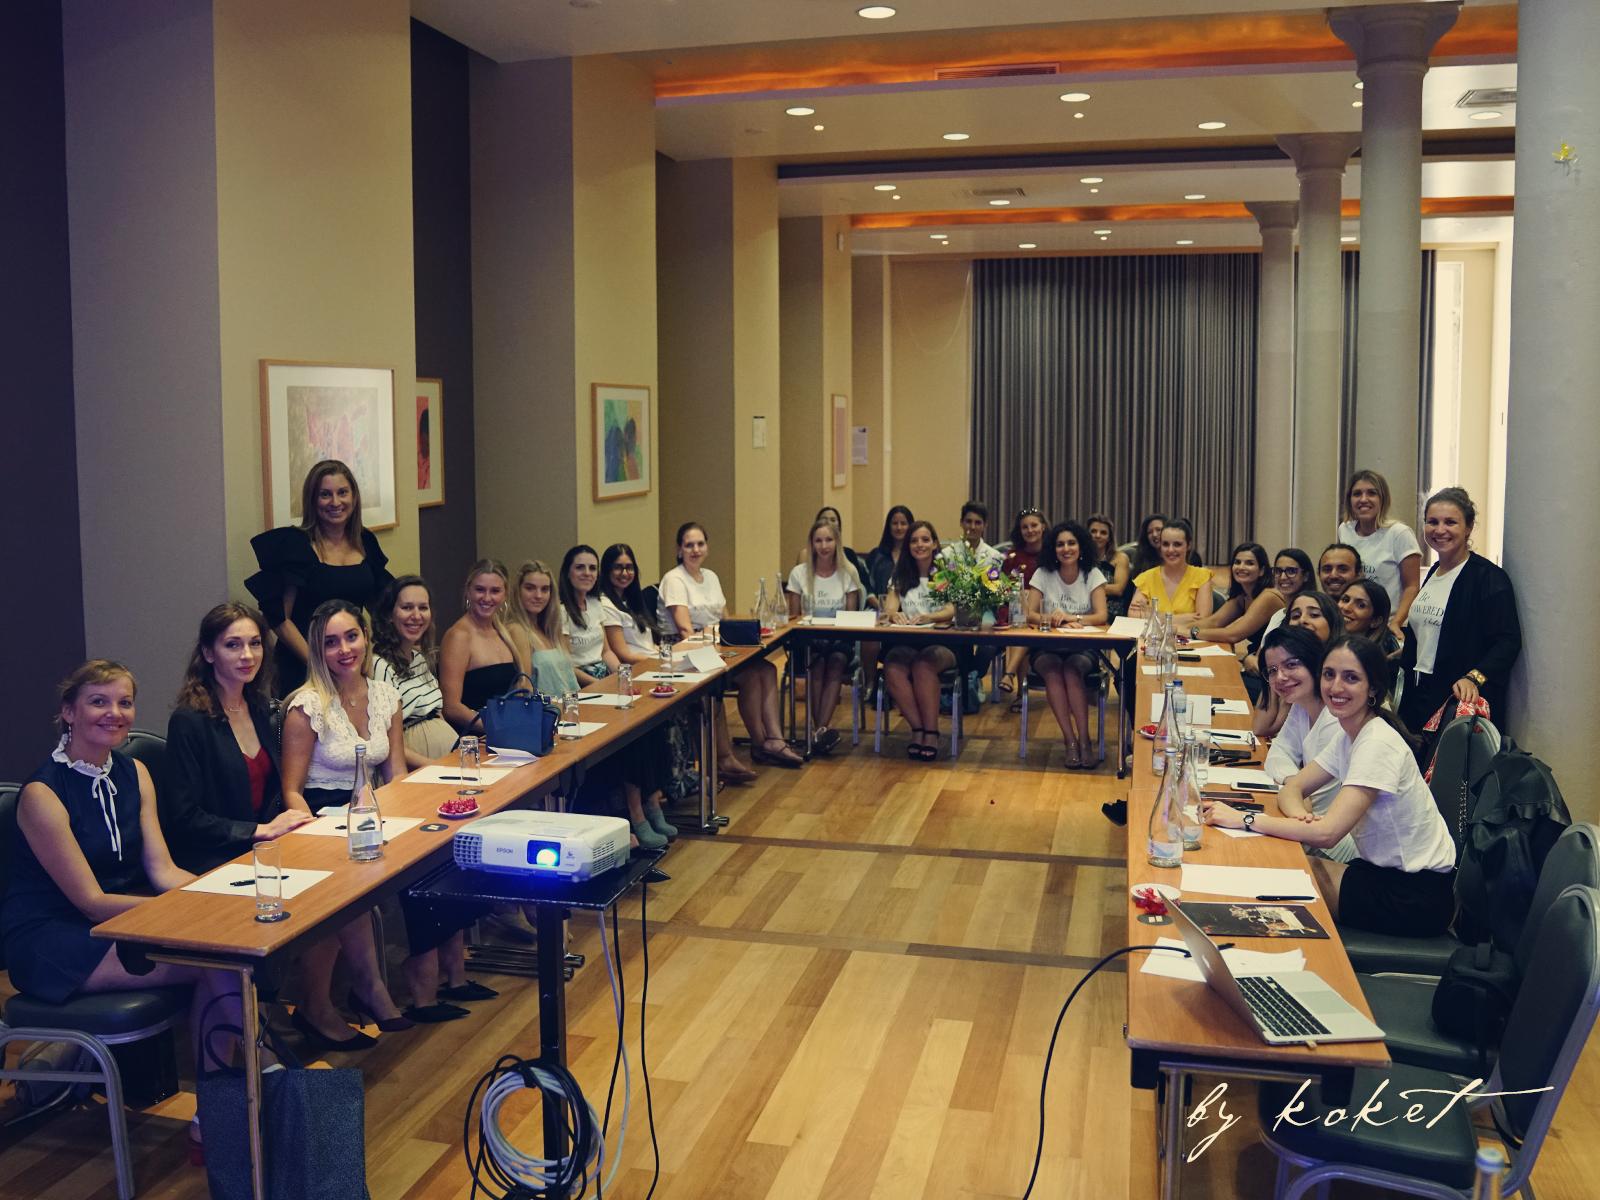 KOKET Furniture Annual Team Building Meeting - koket internship - koket careers - be empowered by koket - women empowerment